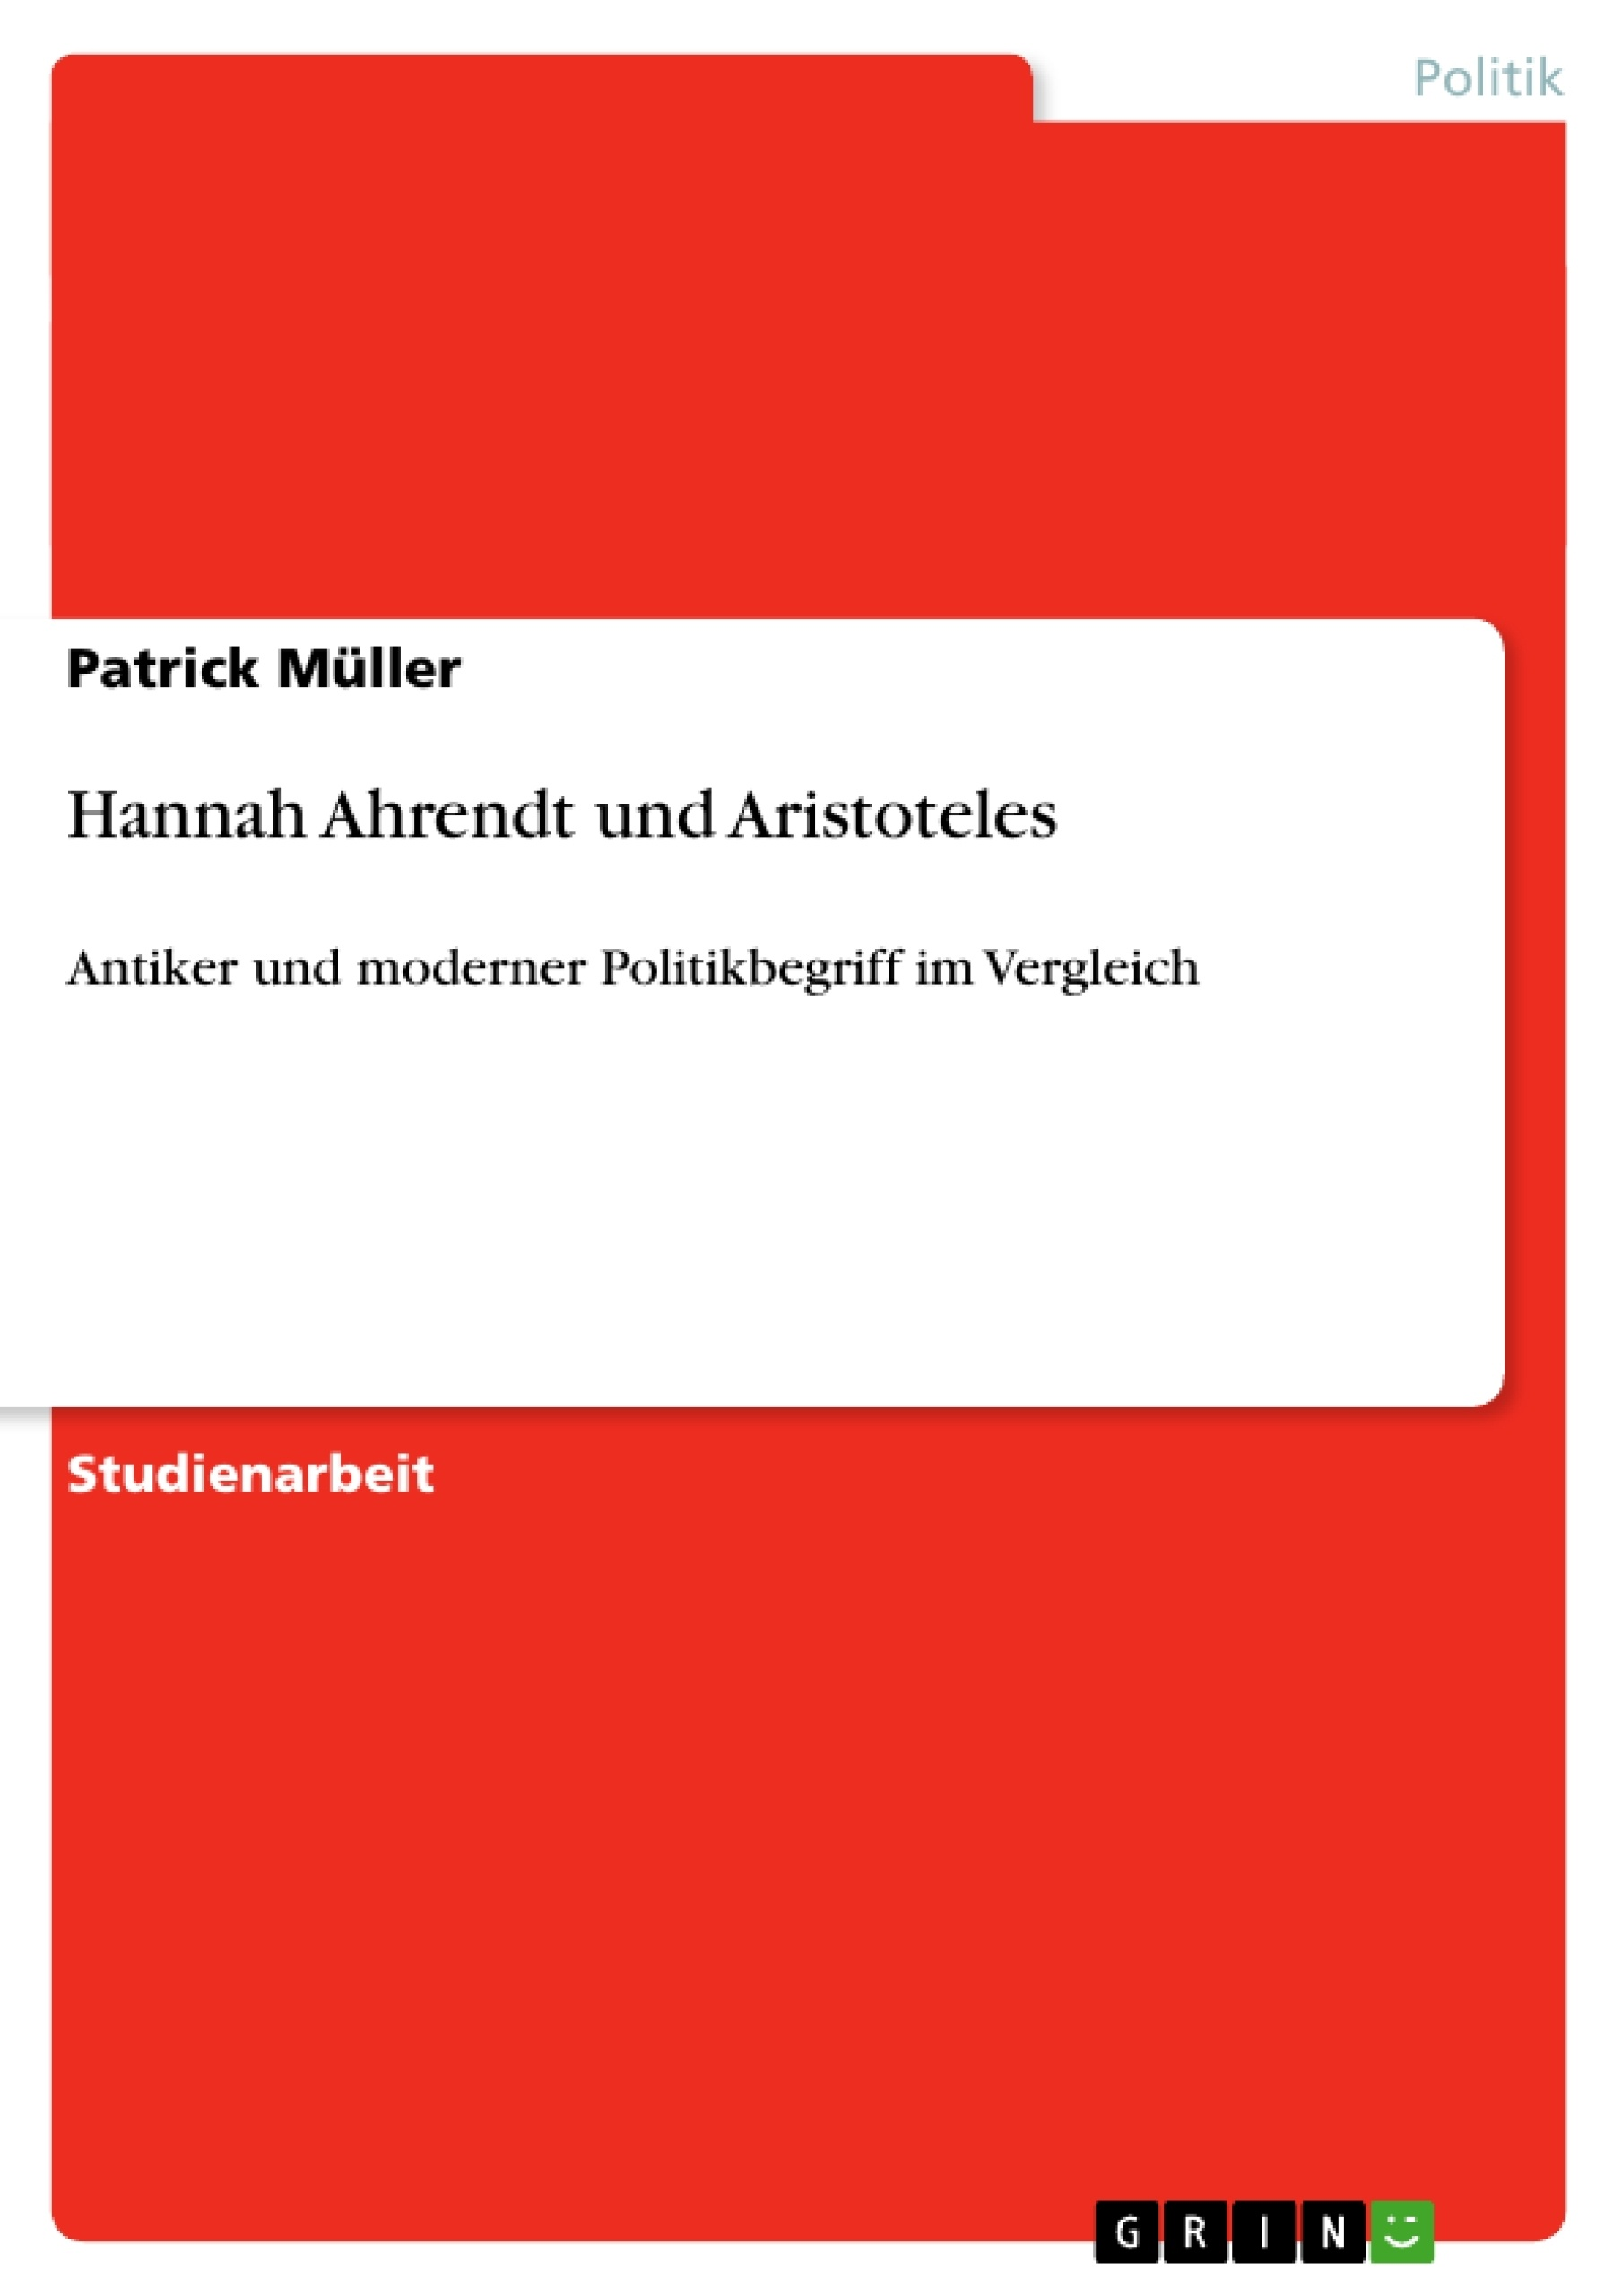 Titel: Hannah Ahrendt und Aristoteles